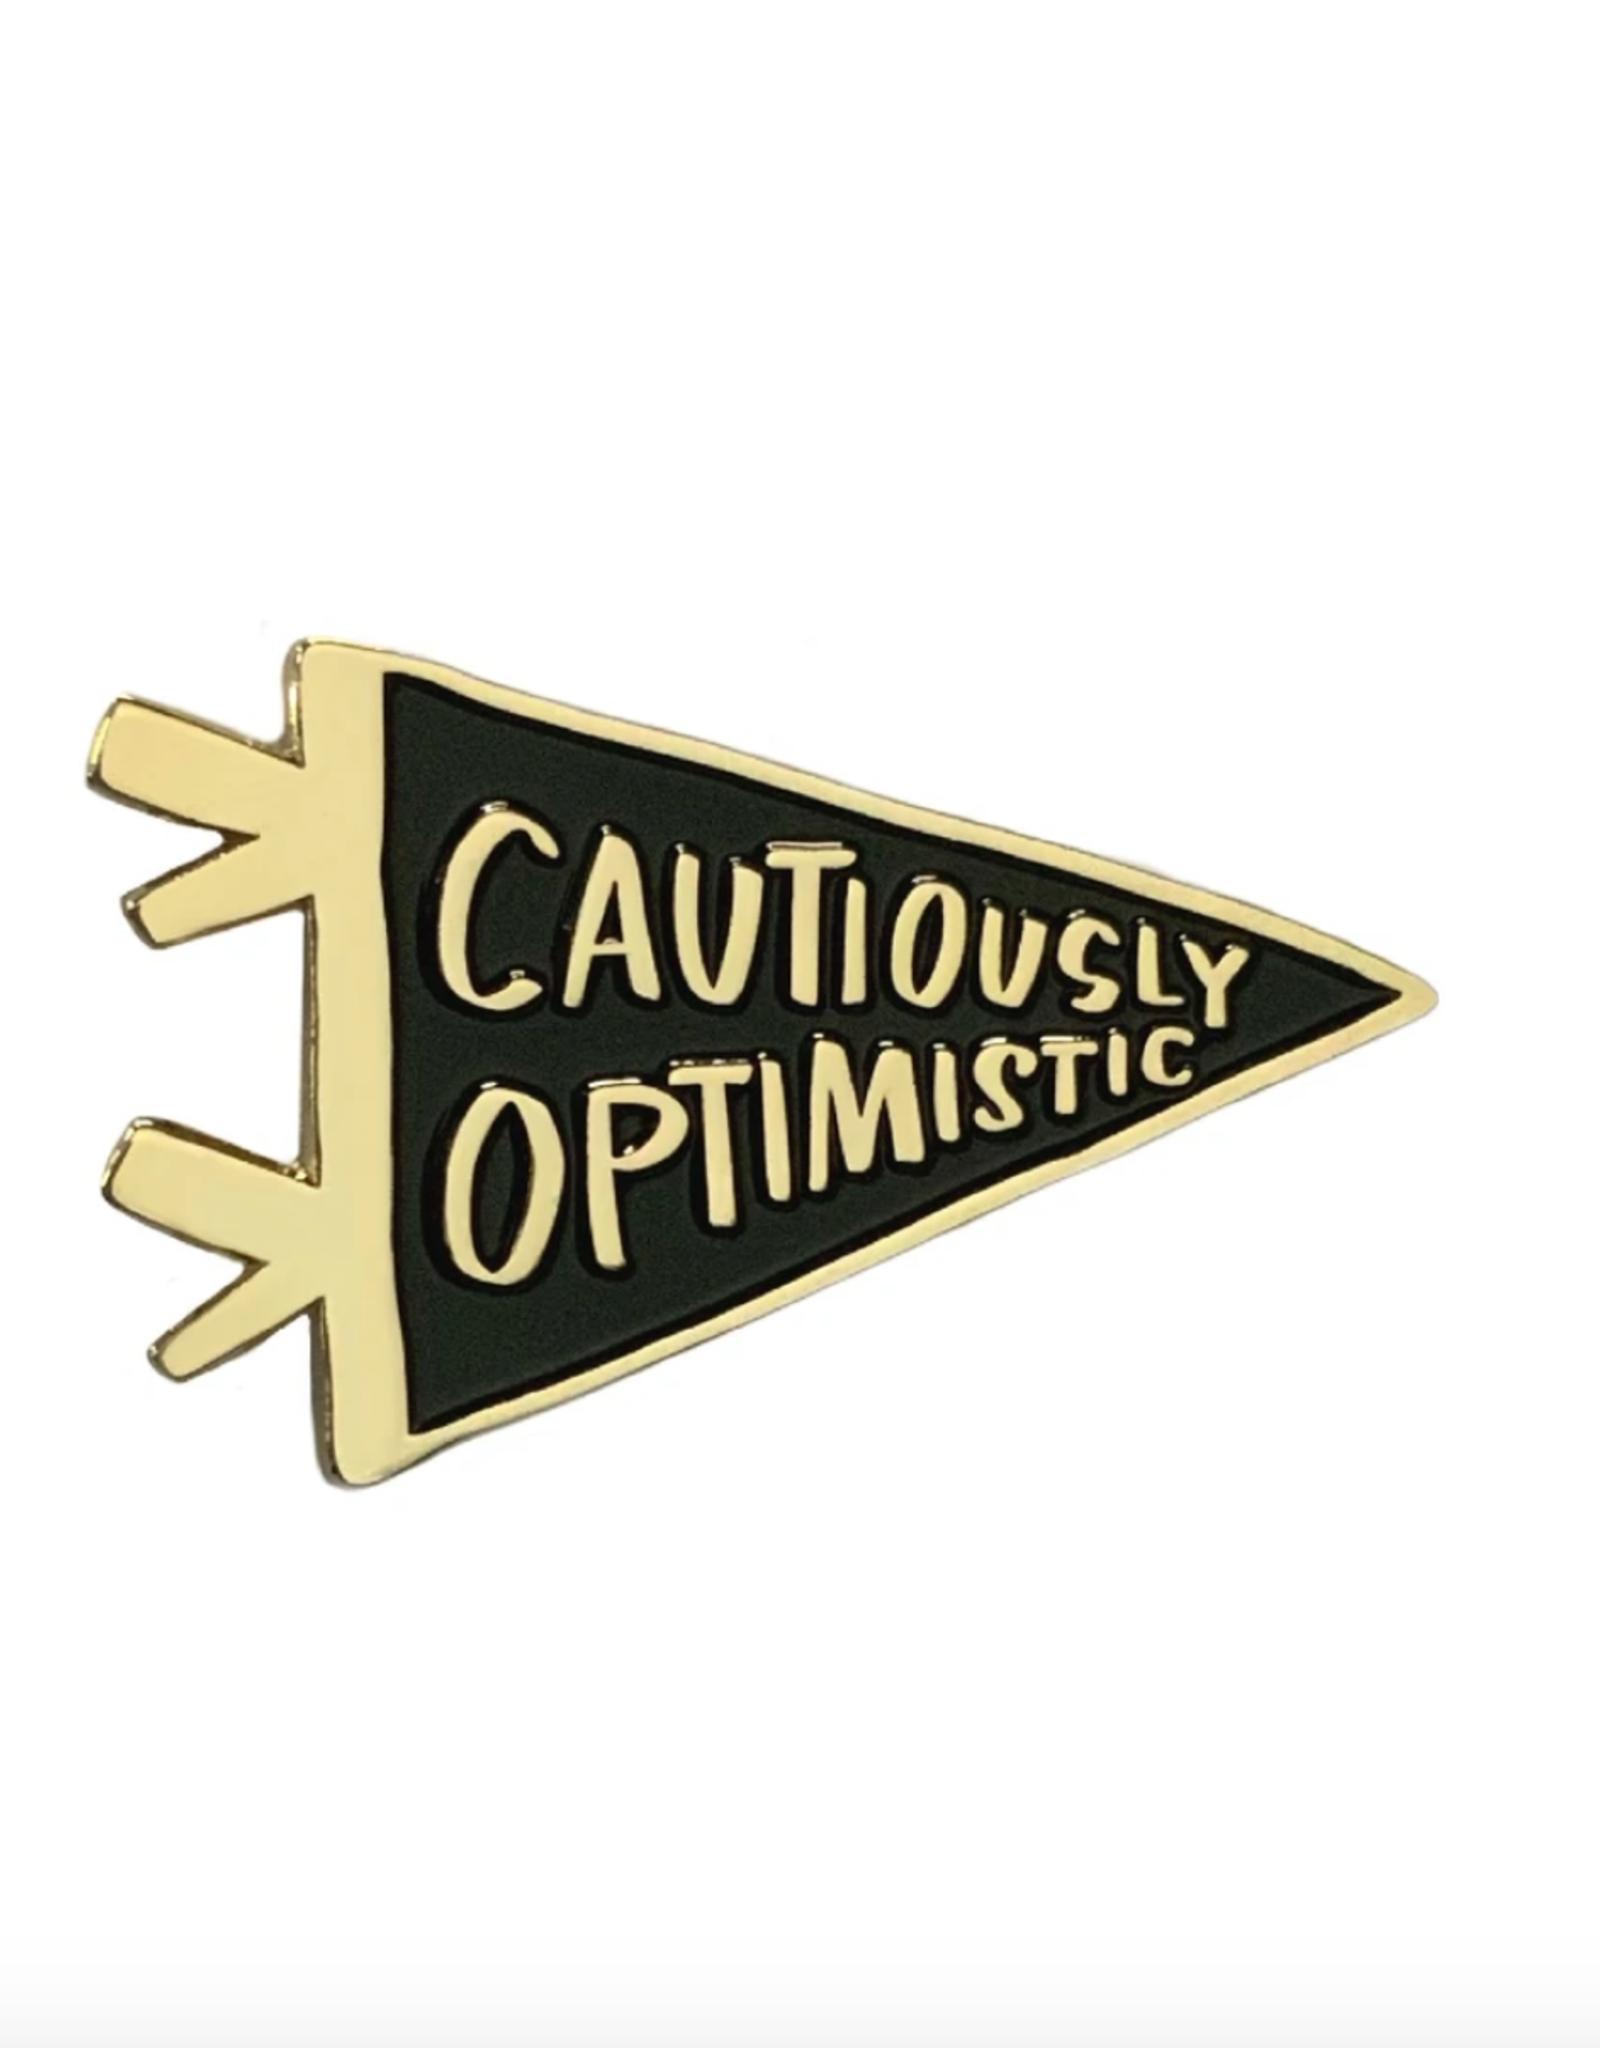 Enamel Pin: Cautiously Optimistic